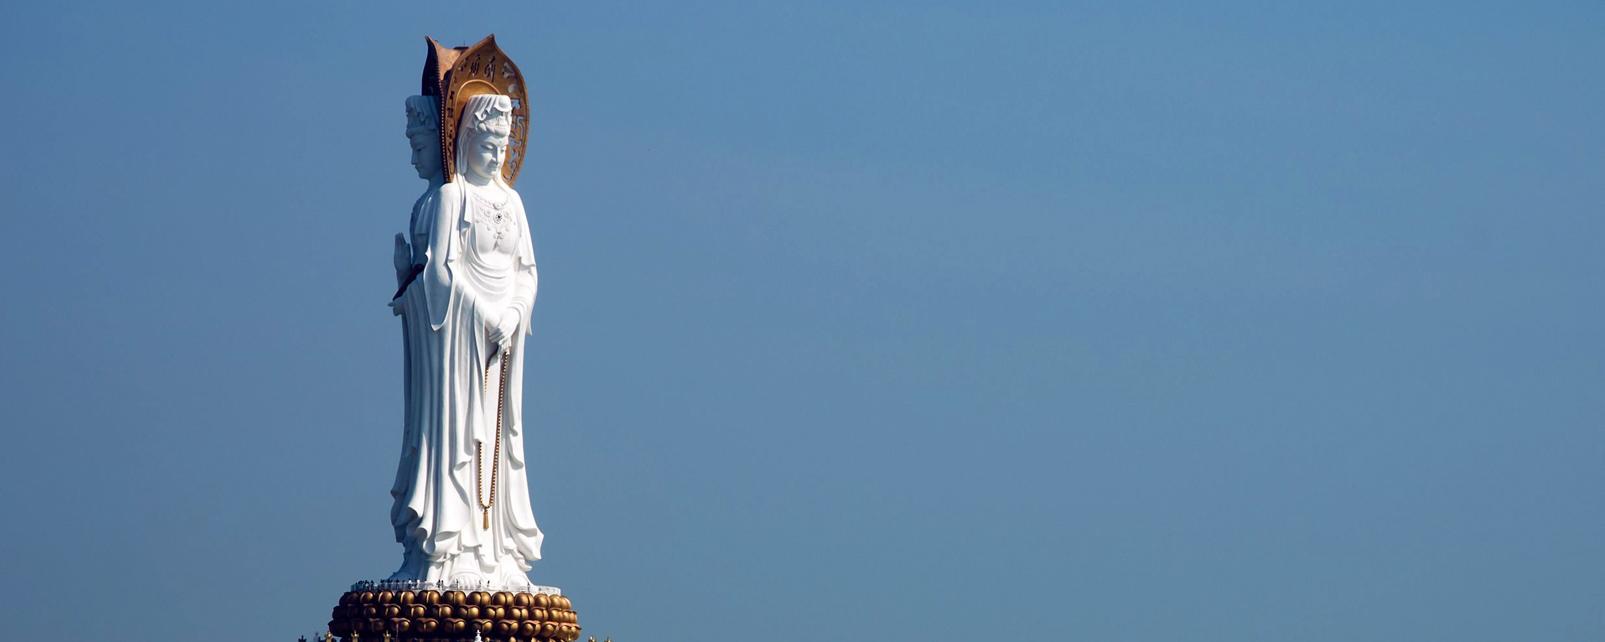 Asie, Chine, Hainan, Guanyin, déesse, miséricorde, religion, mer,